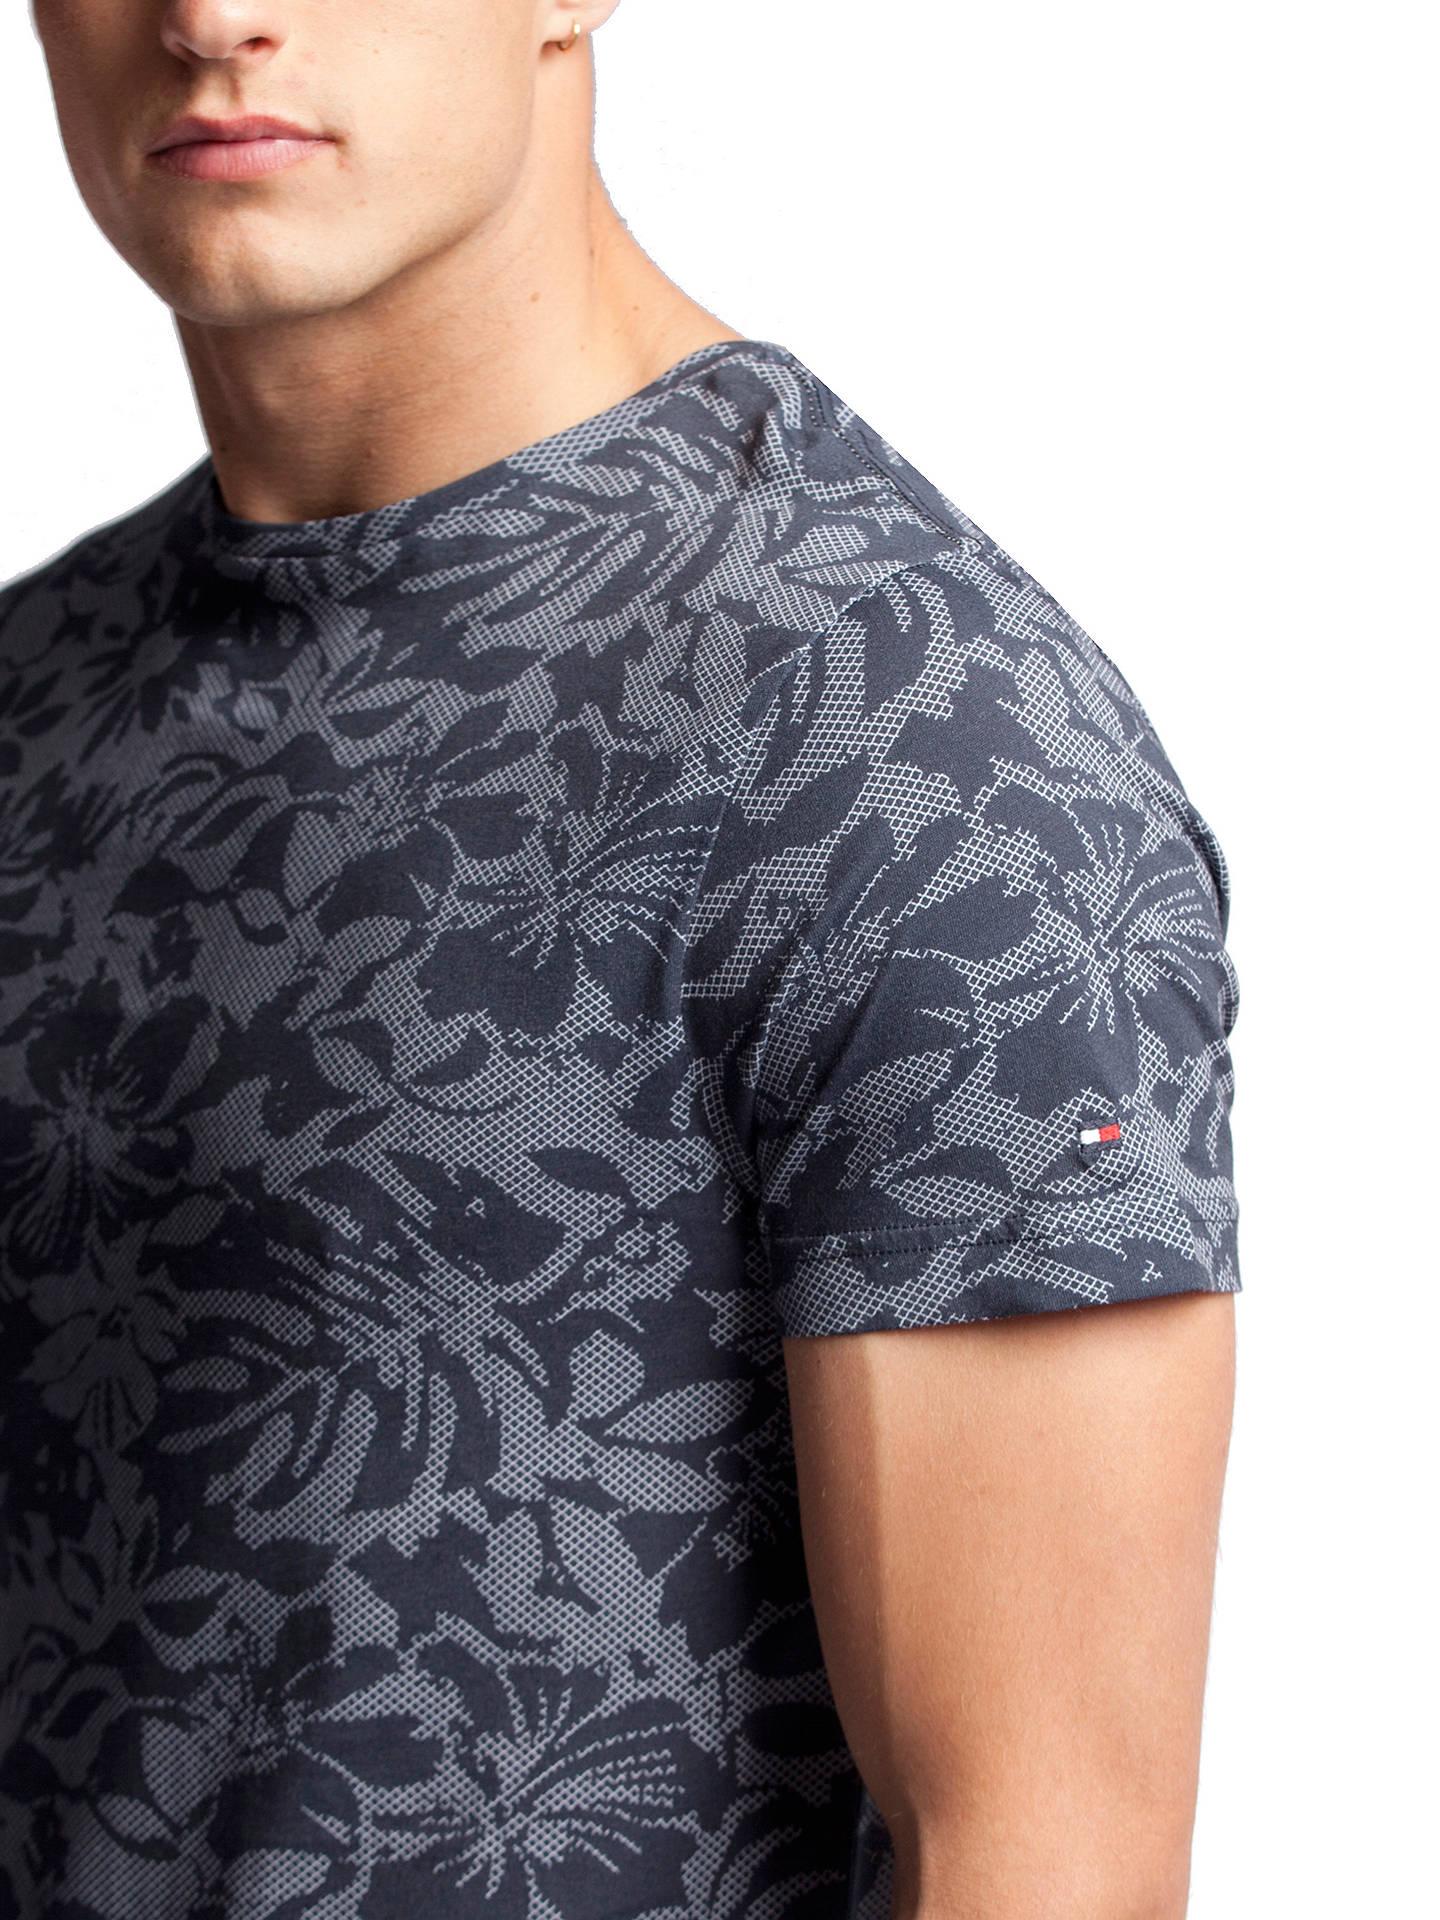 Tommy Hilfiger Fran Floral Print T shirt, Dutch Navy at John